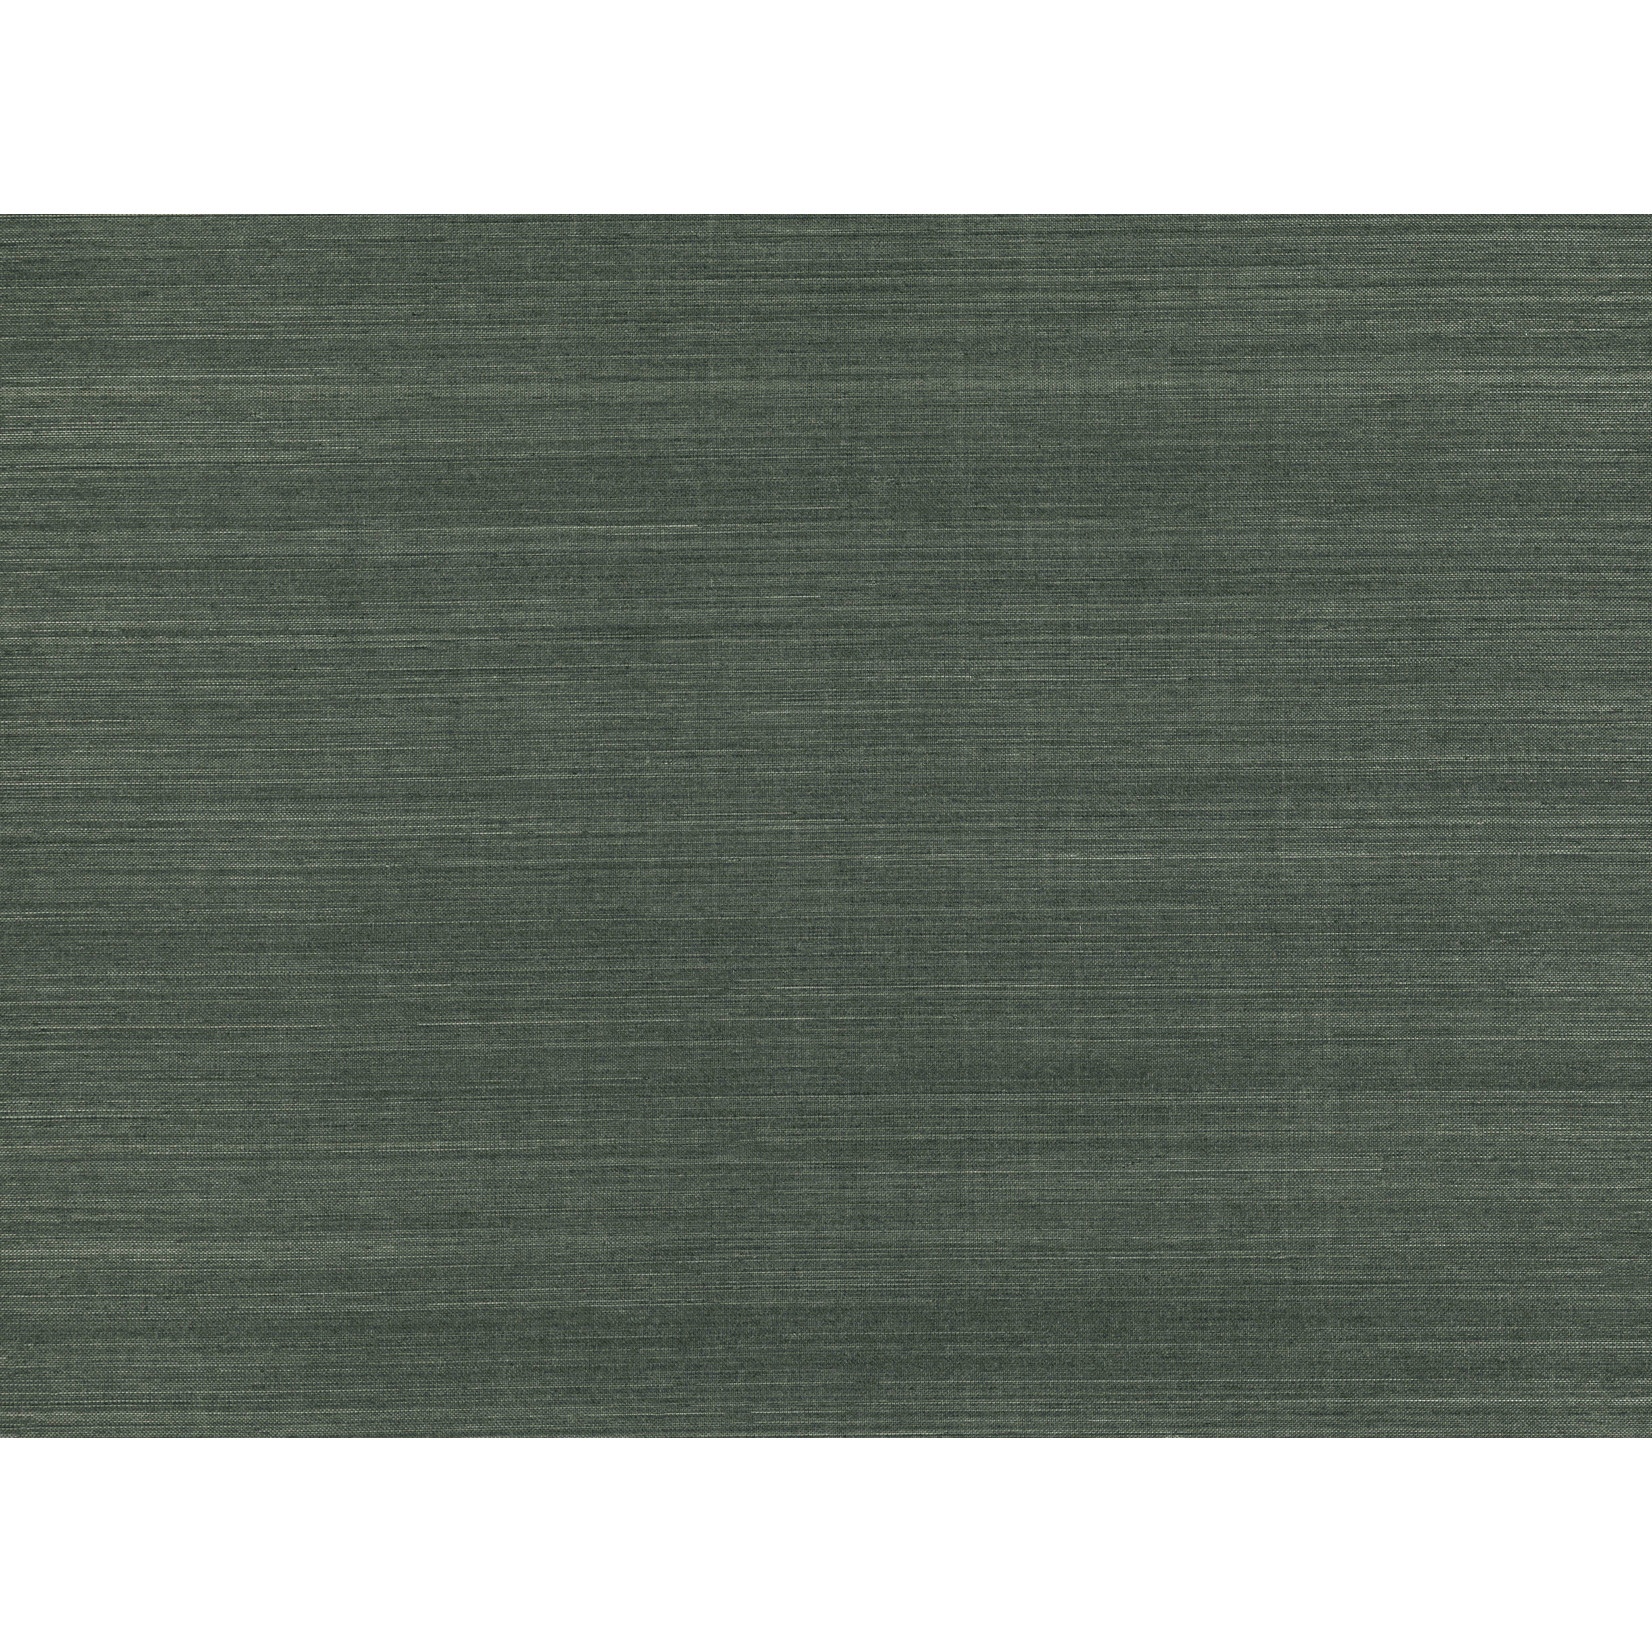 Mark Alexander Grasscloth Handwoven Wallcoverings | Abaca Atlantic